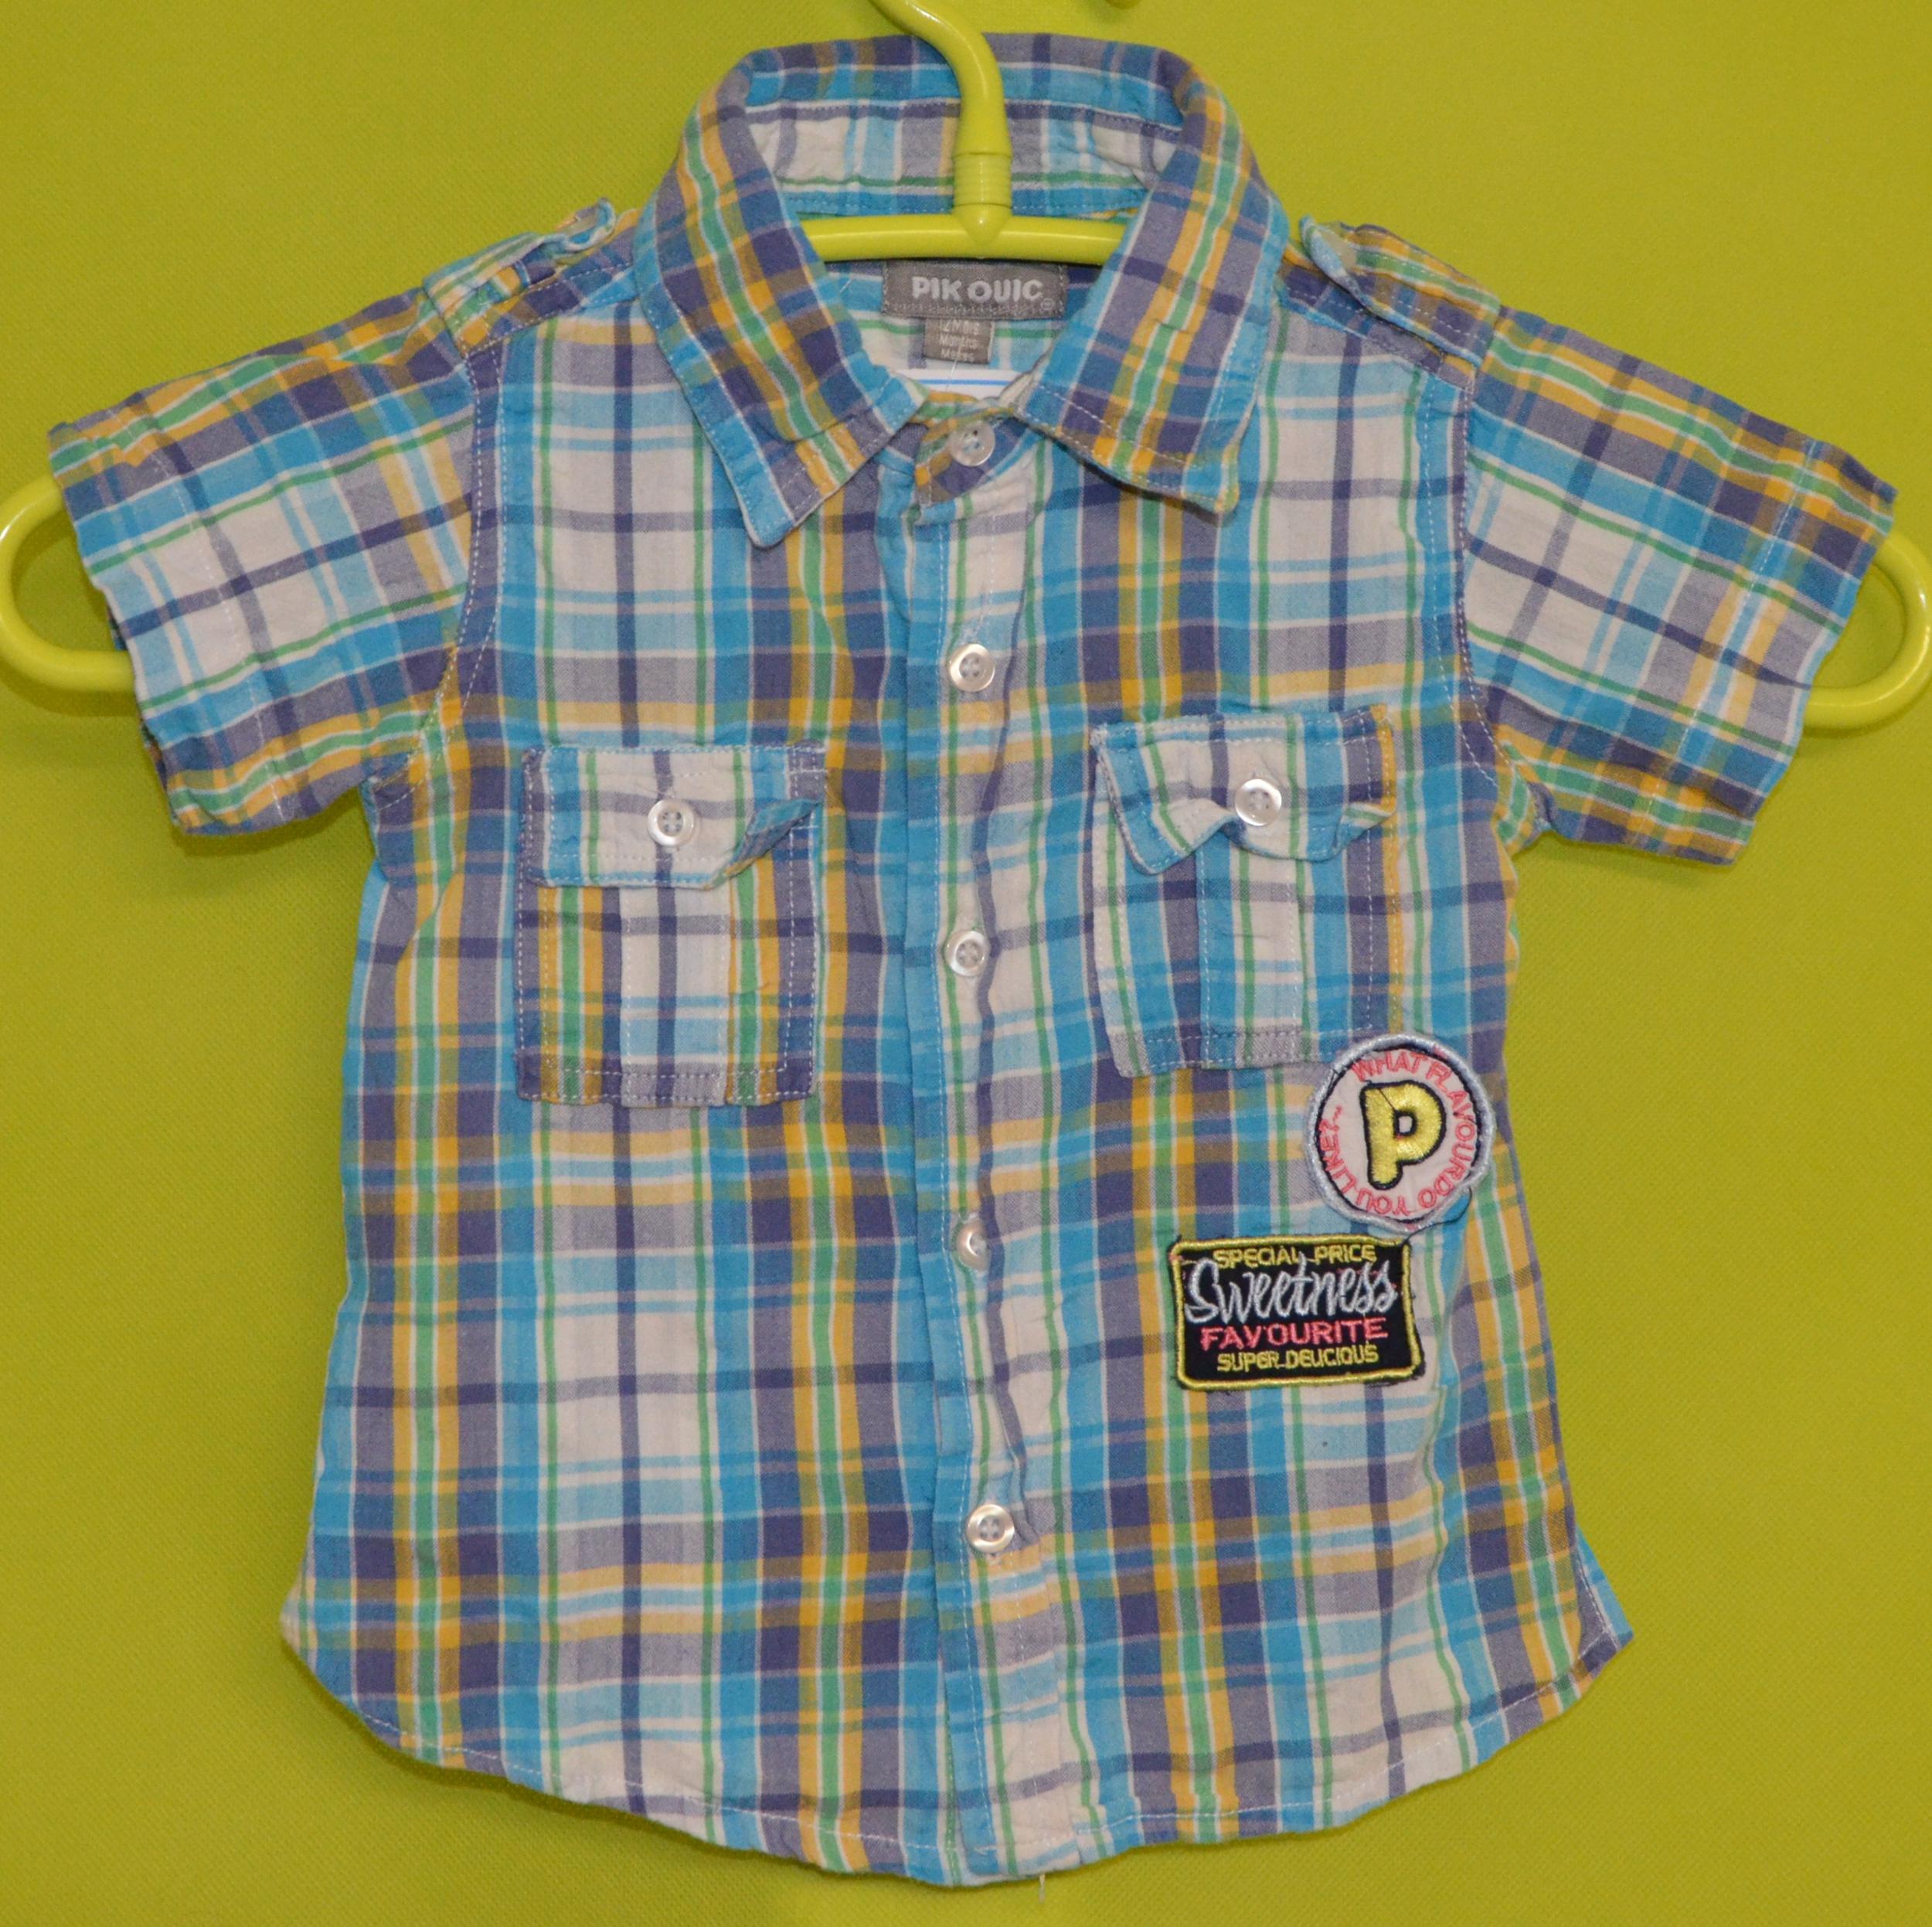 chemise pik ouic 12 mois